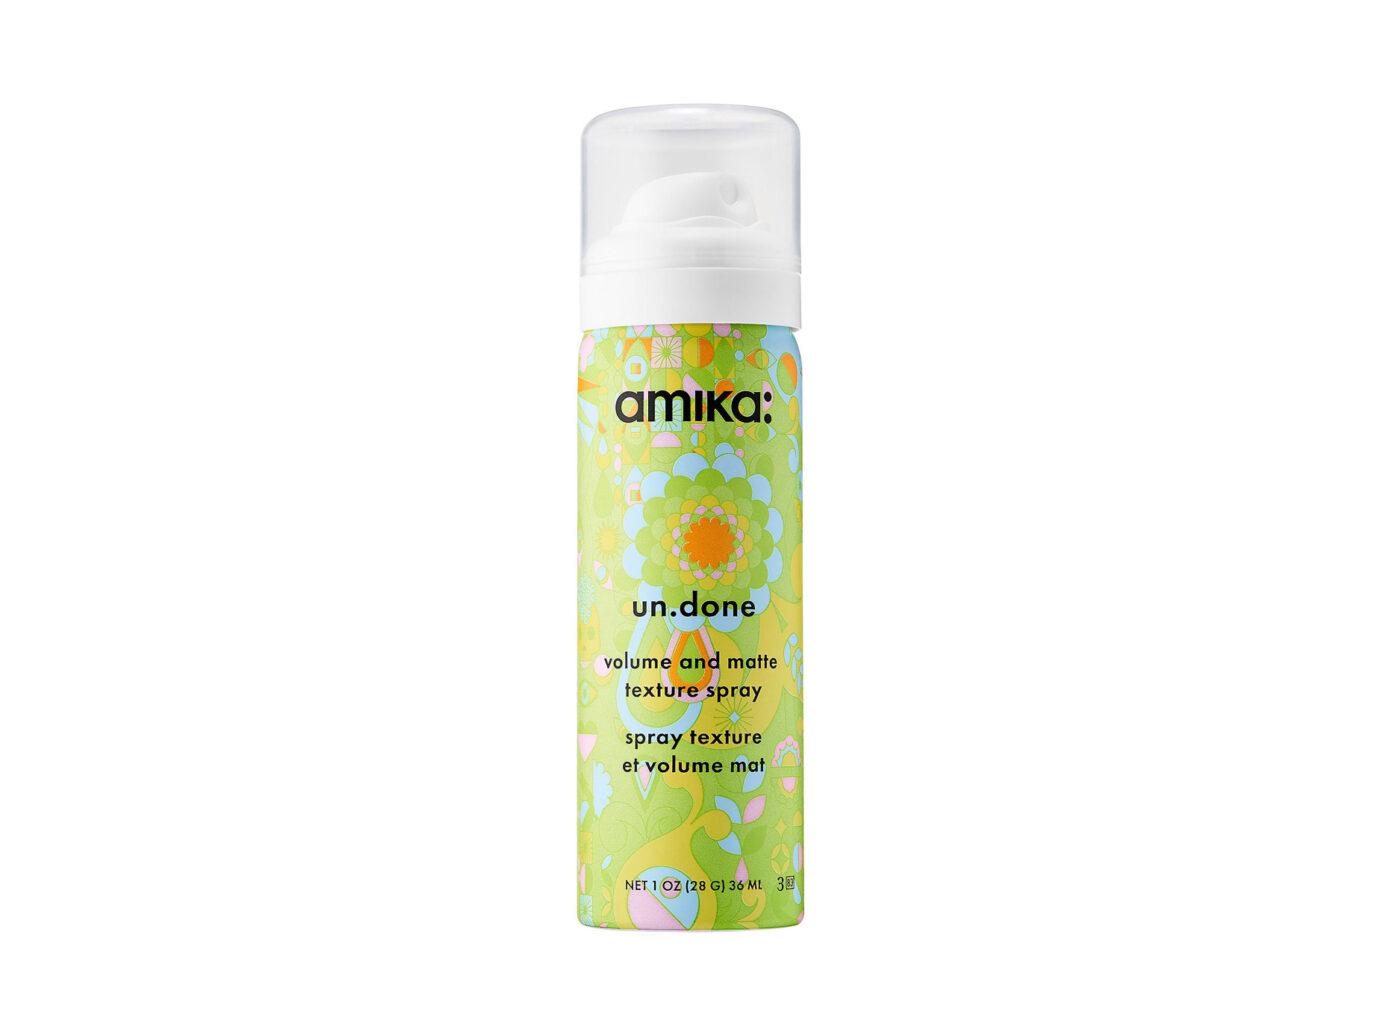 Amika Un.Done Volume and Matte Texture Spray